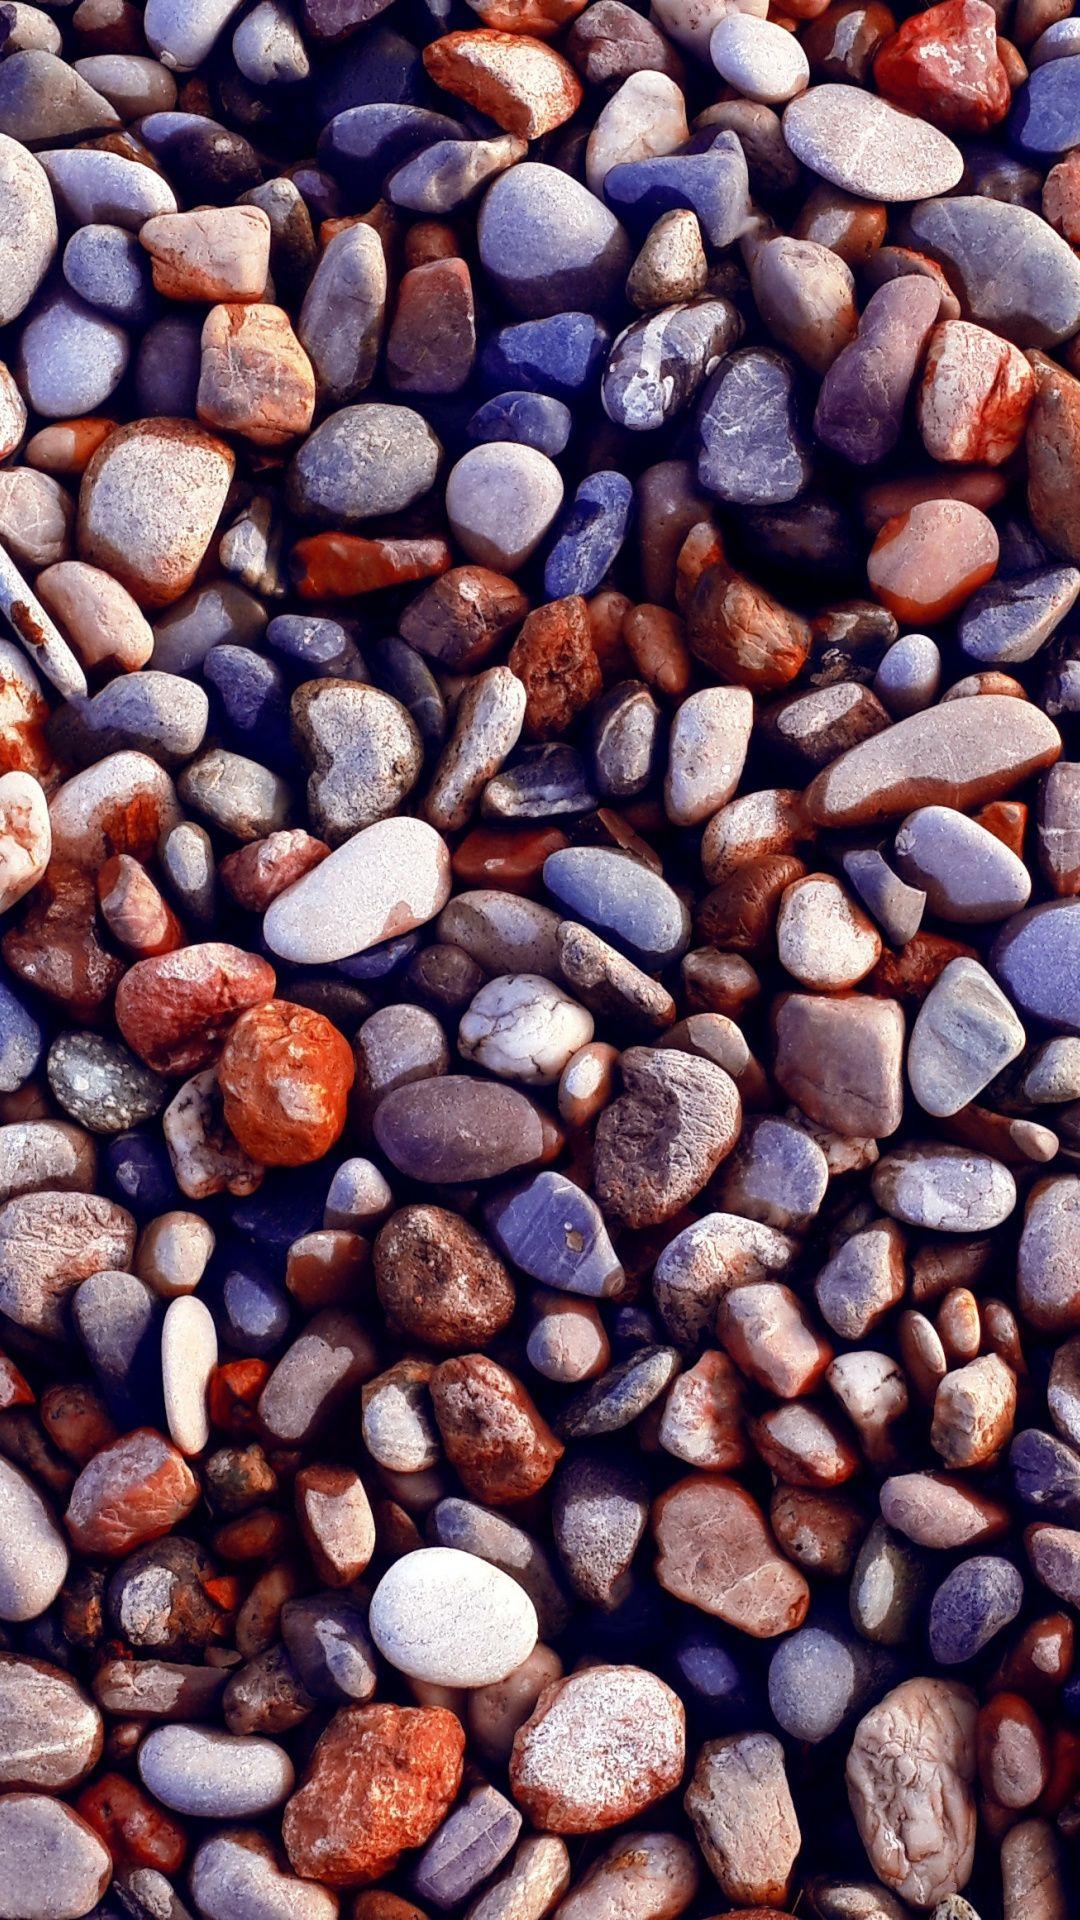 Rocks Stones Cobblestone Pebble Sands Wallpaper Hd Wallpaper Rocks Cobblesone Pebble Sands Stones Rock Sand S Qhd Wallpaper Stone Wallpaper Stone